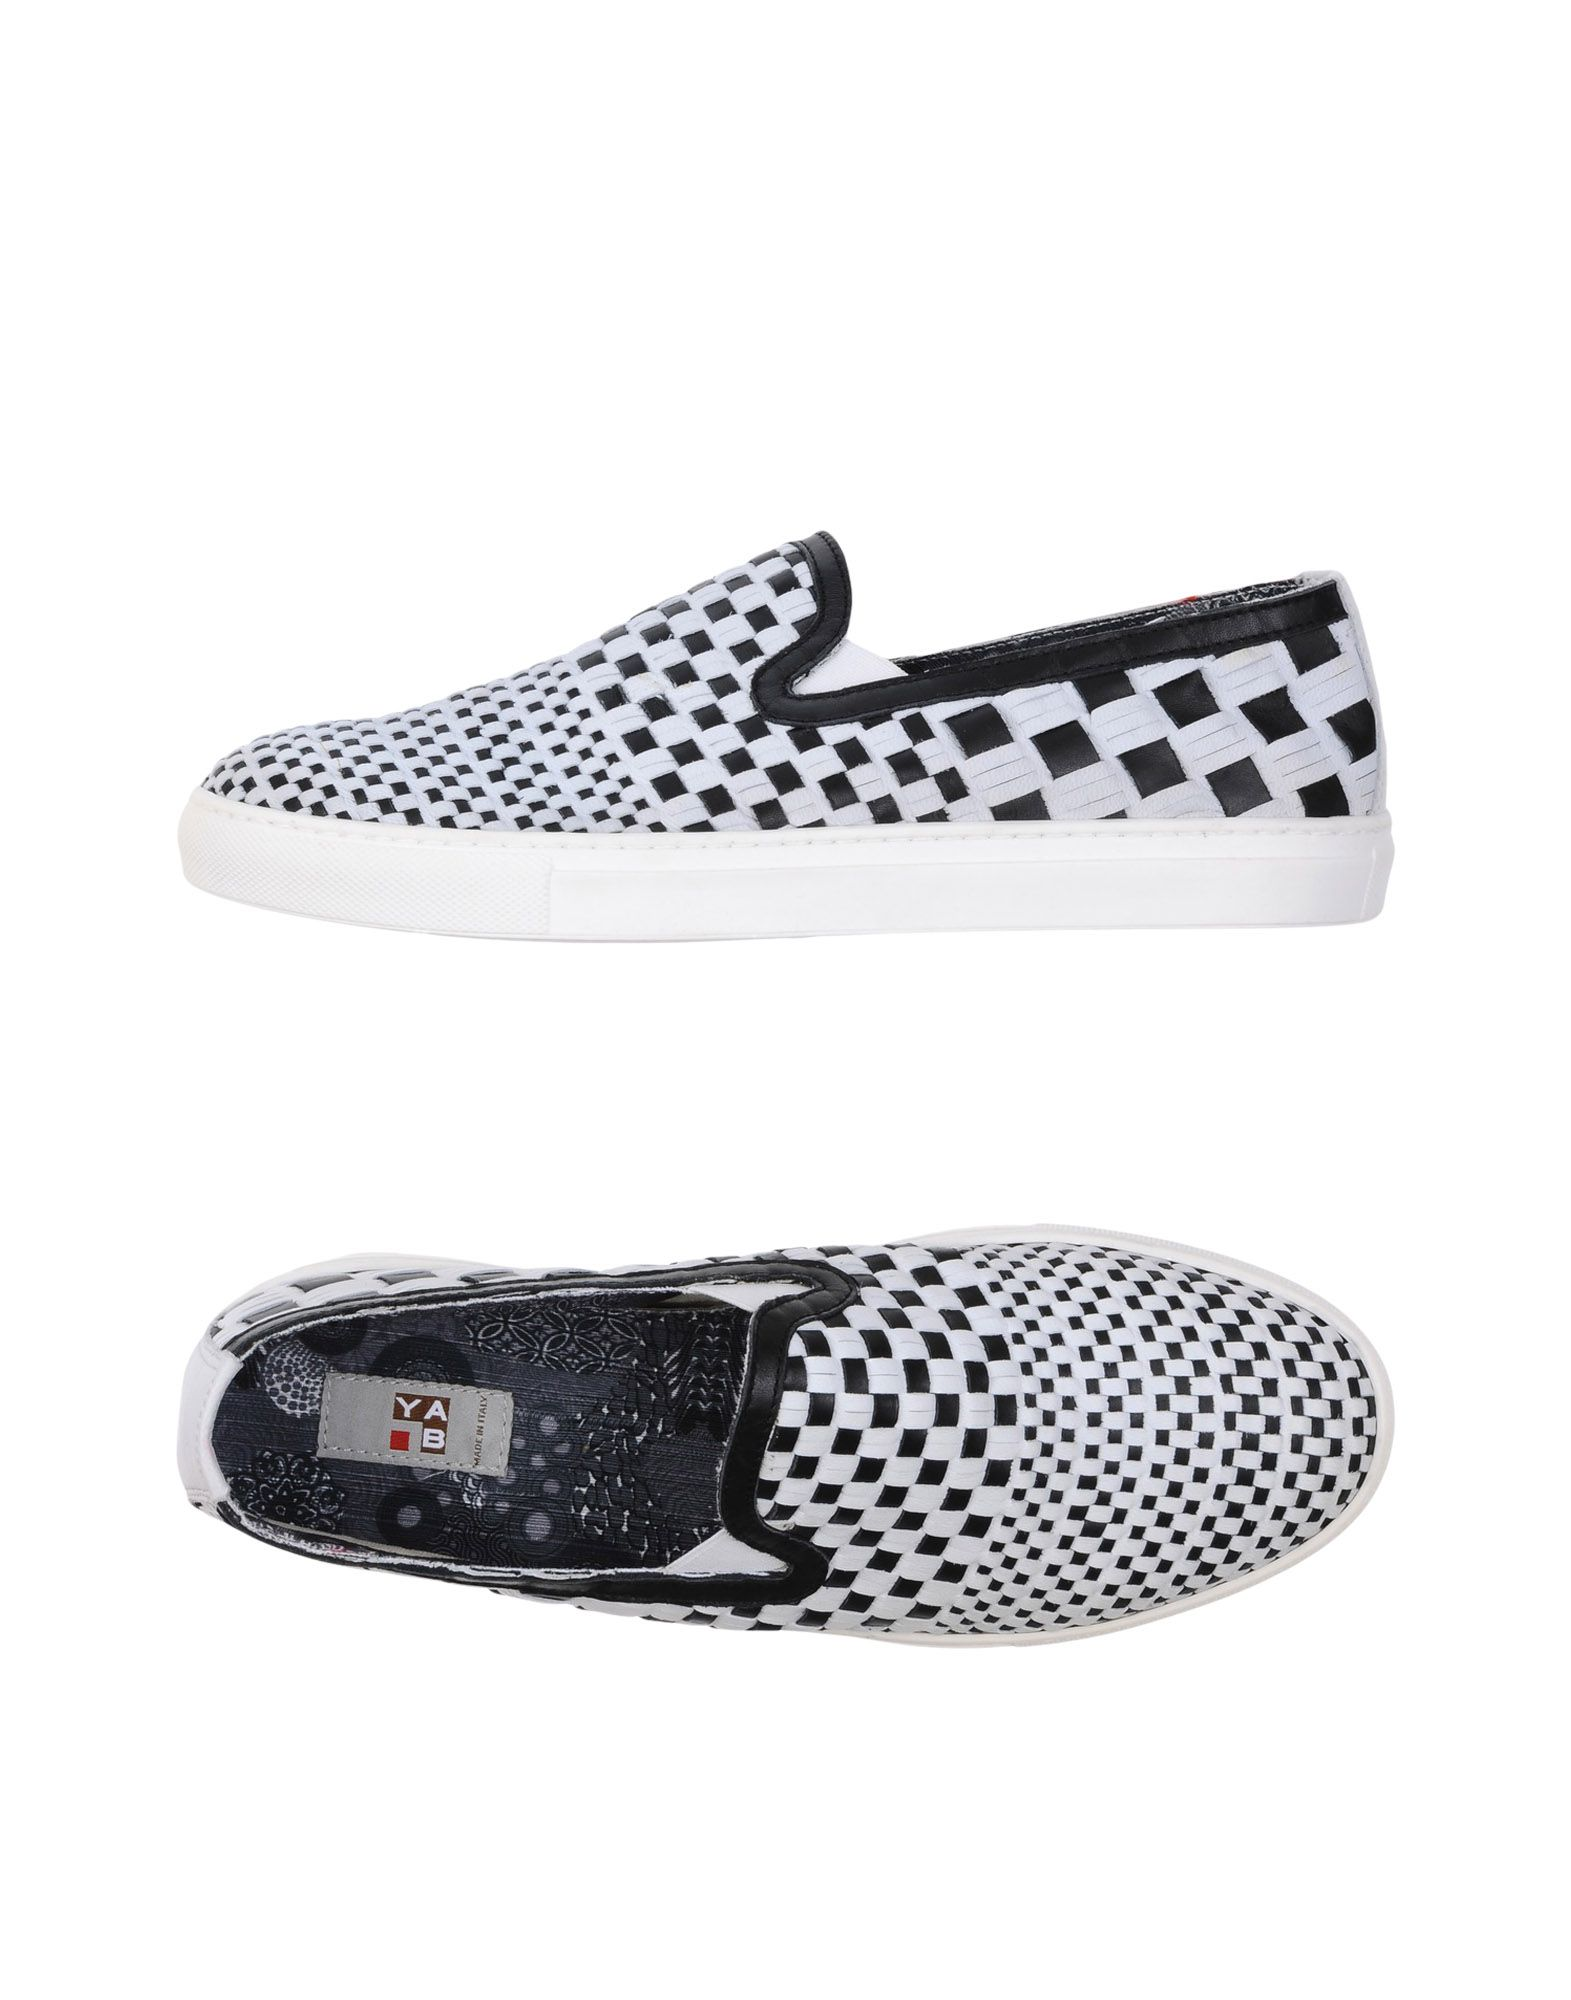 Moda Sneakers Yab Uomo - 11227003HF